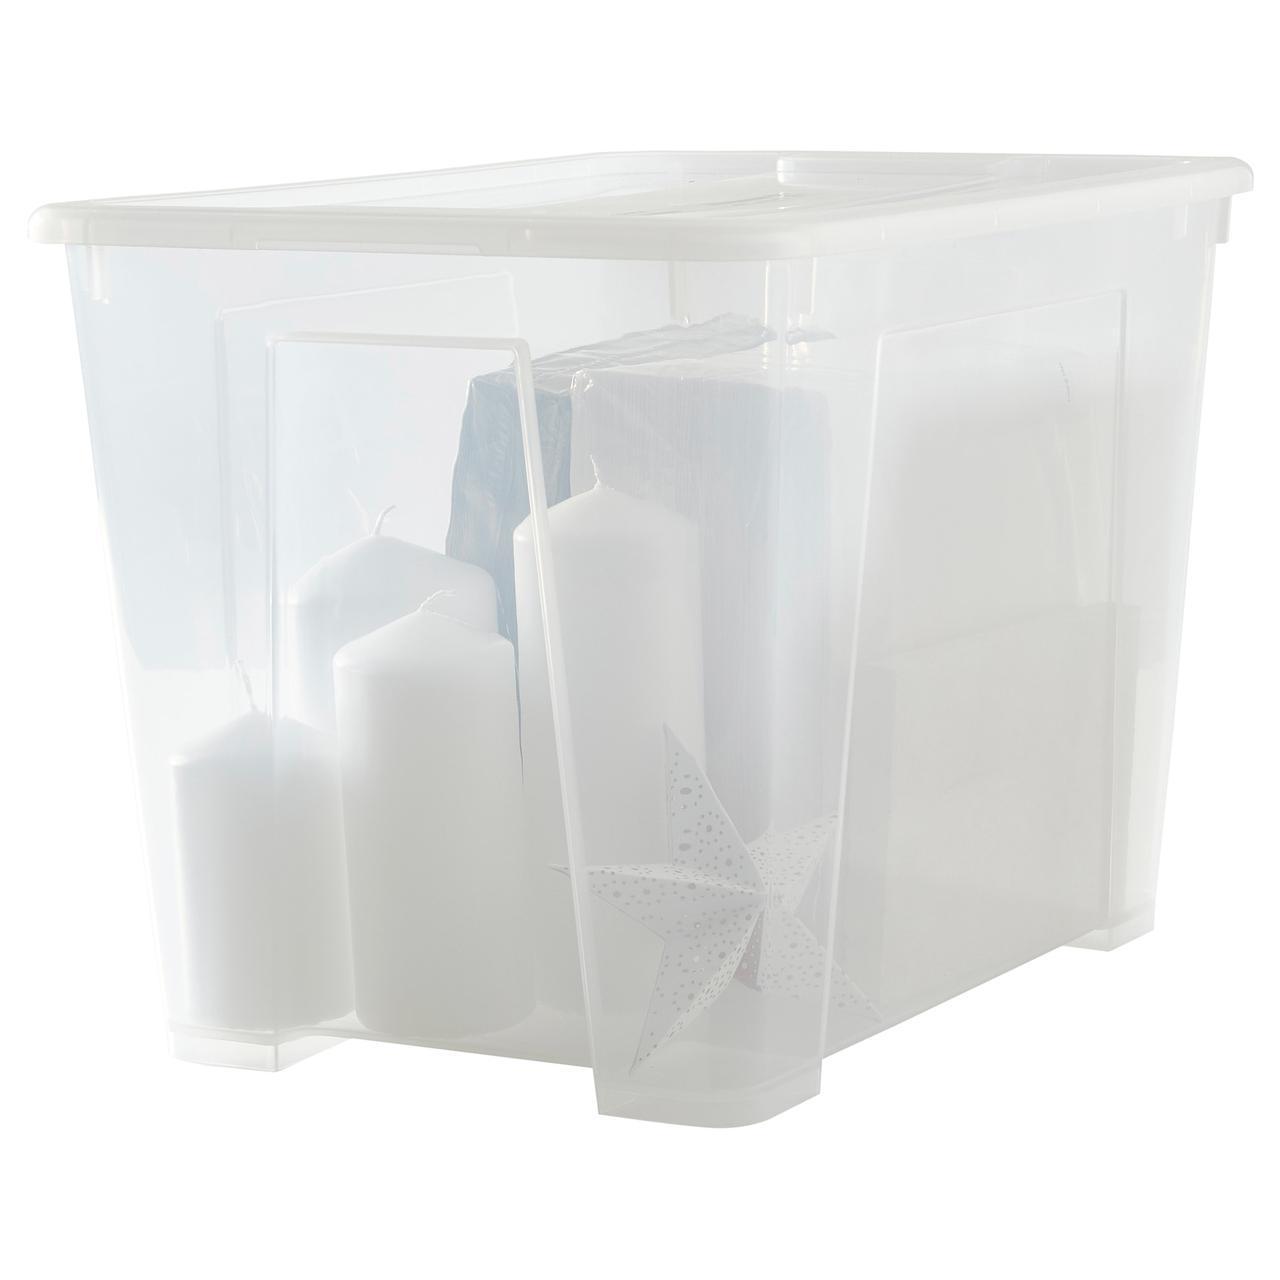 IKEA SAMLA (798.508.75) Коробка с крышкой, прозрачная